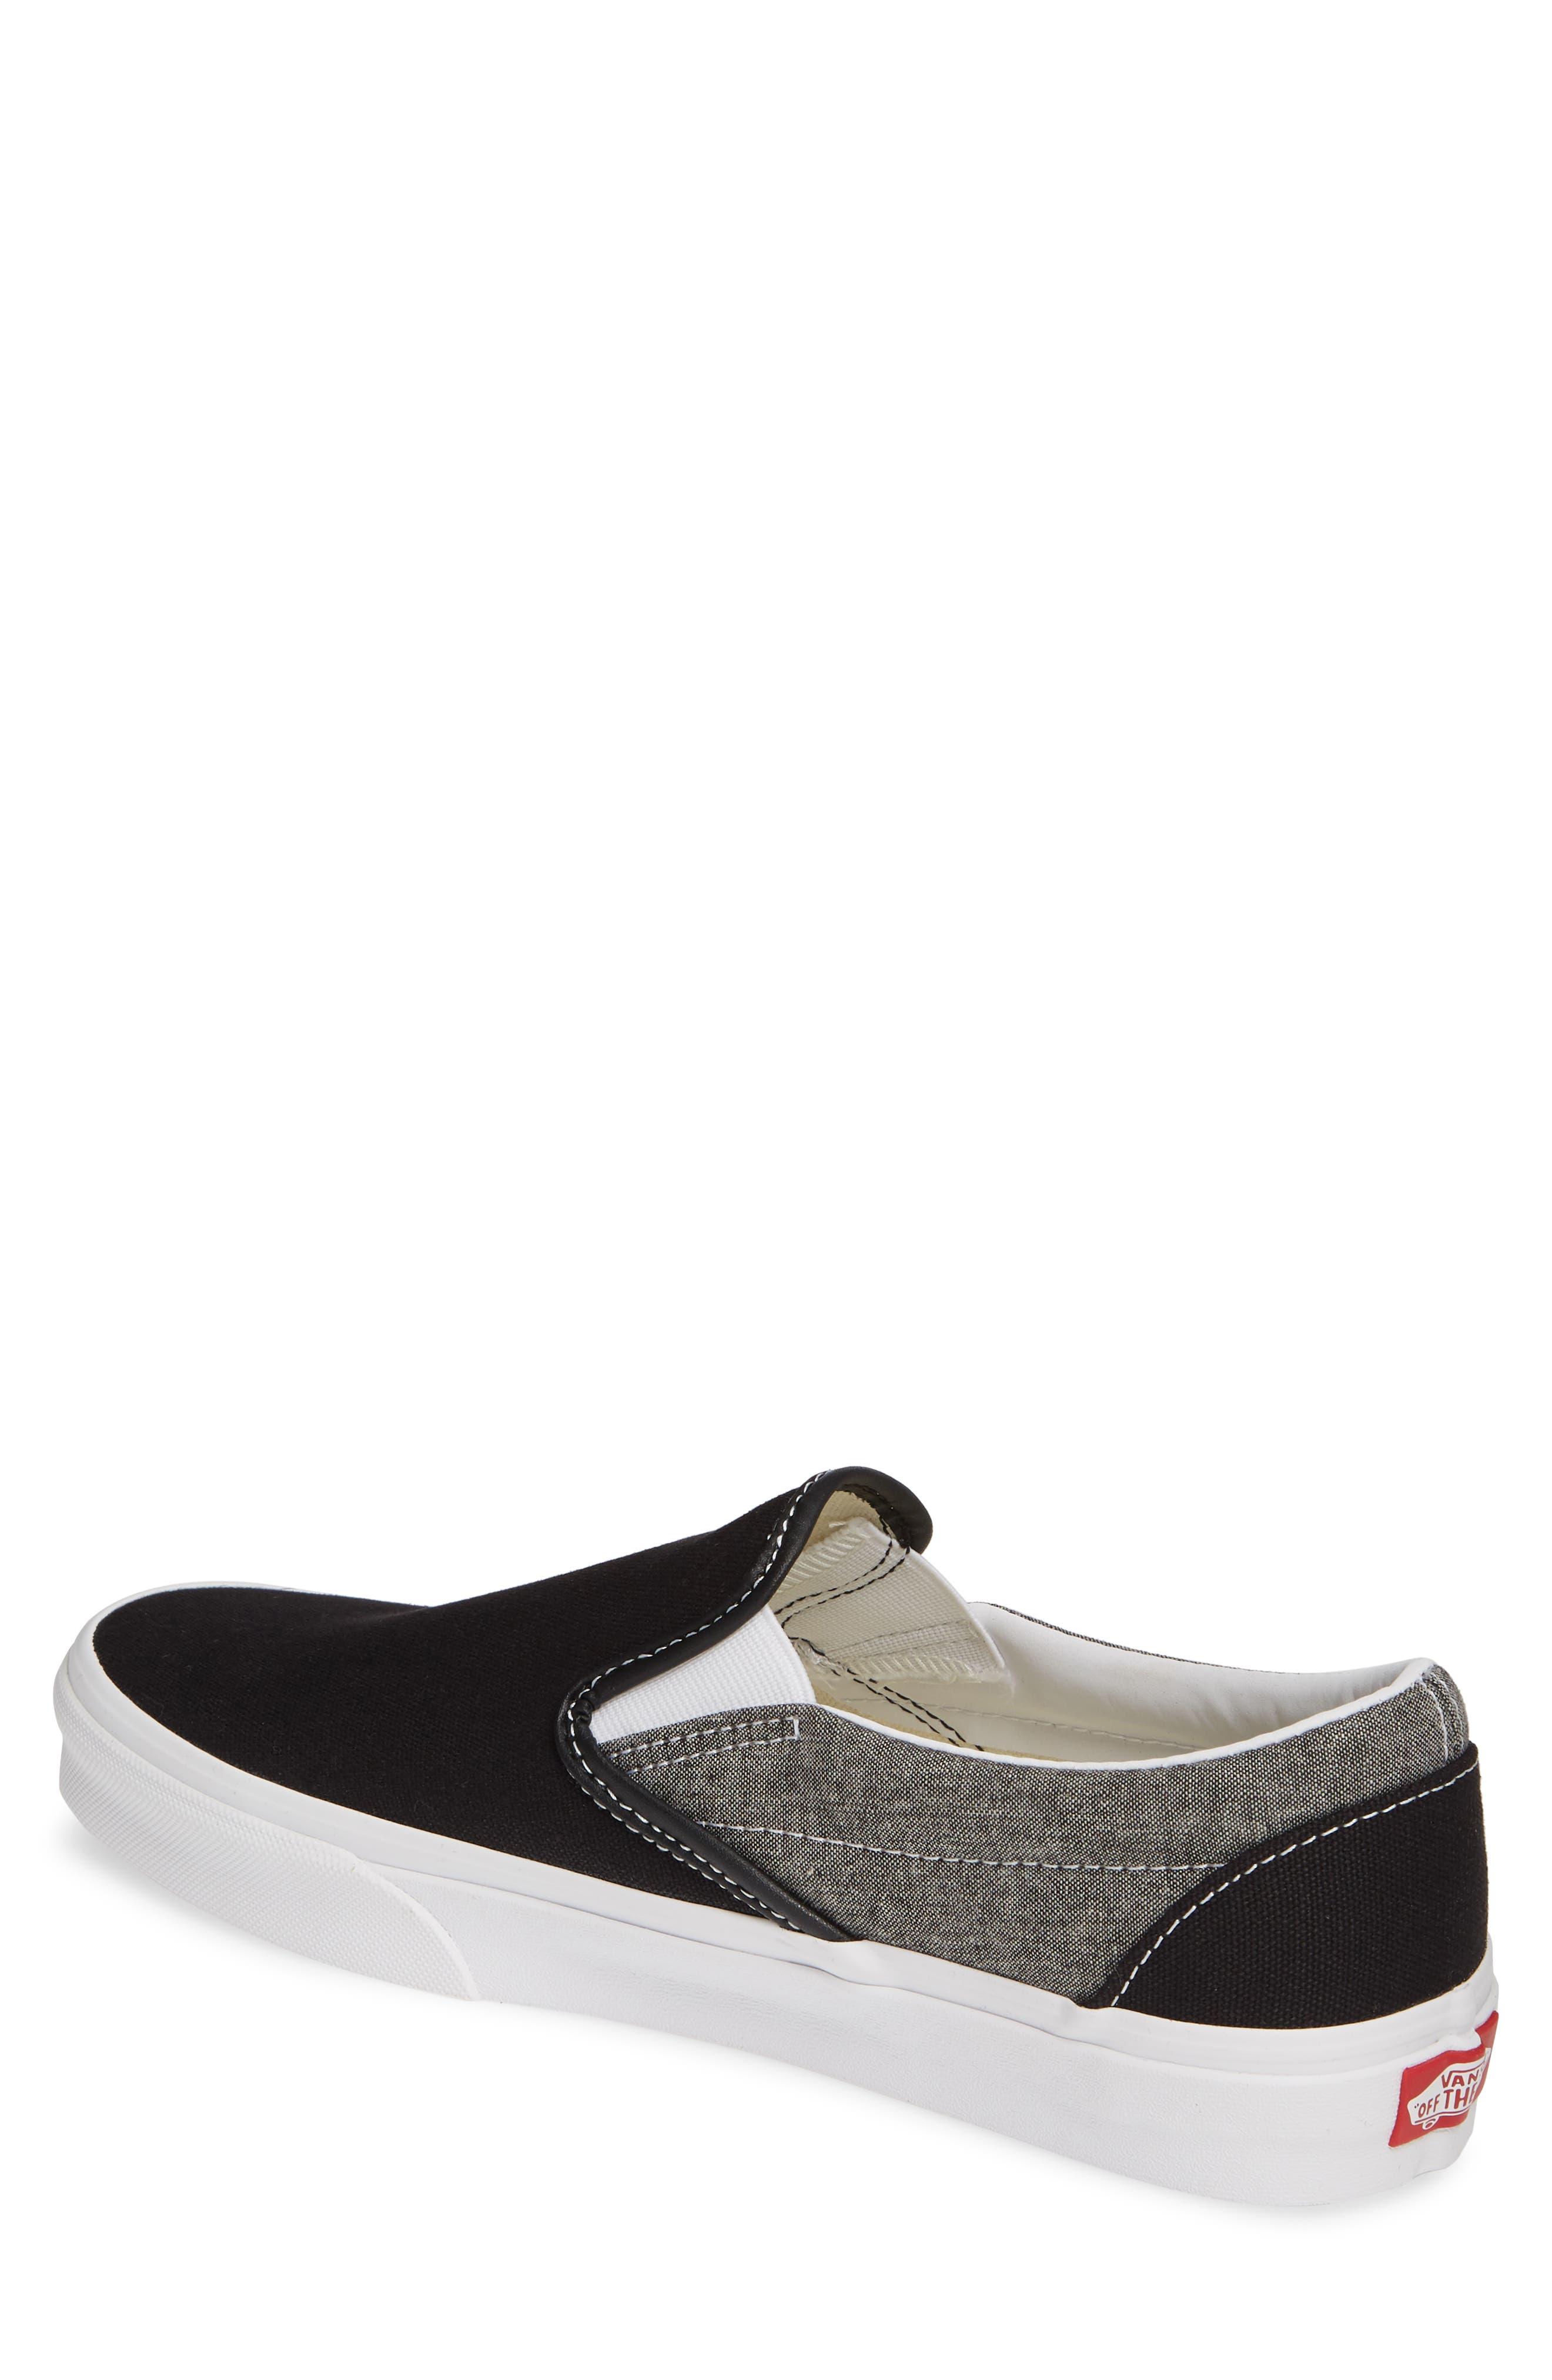 VANS, 'Classic' Slip-On Sneaker, Alternate thumbnail 2, color, CANVAS BLACK/ WHITE CHAMBRAY